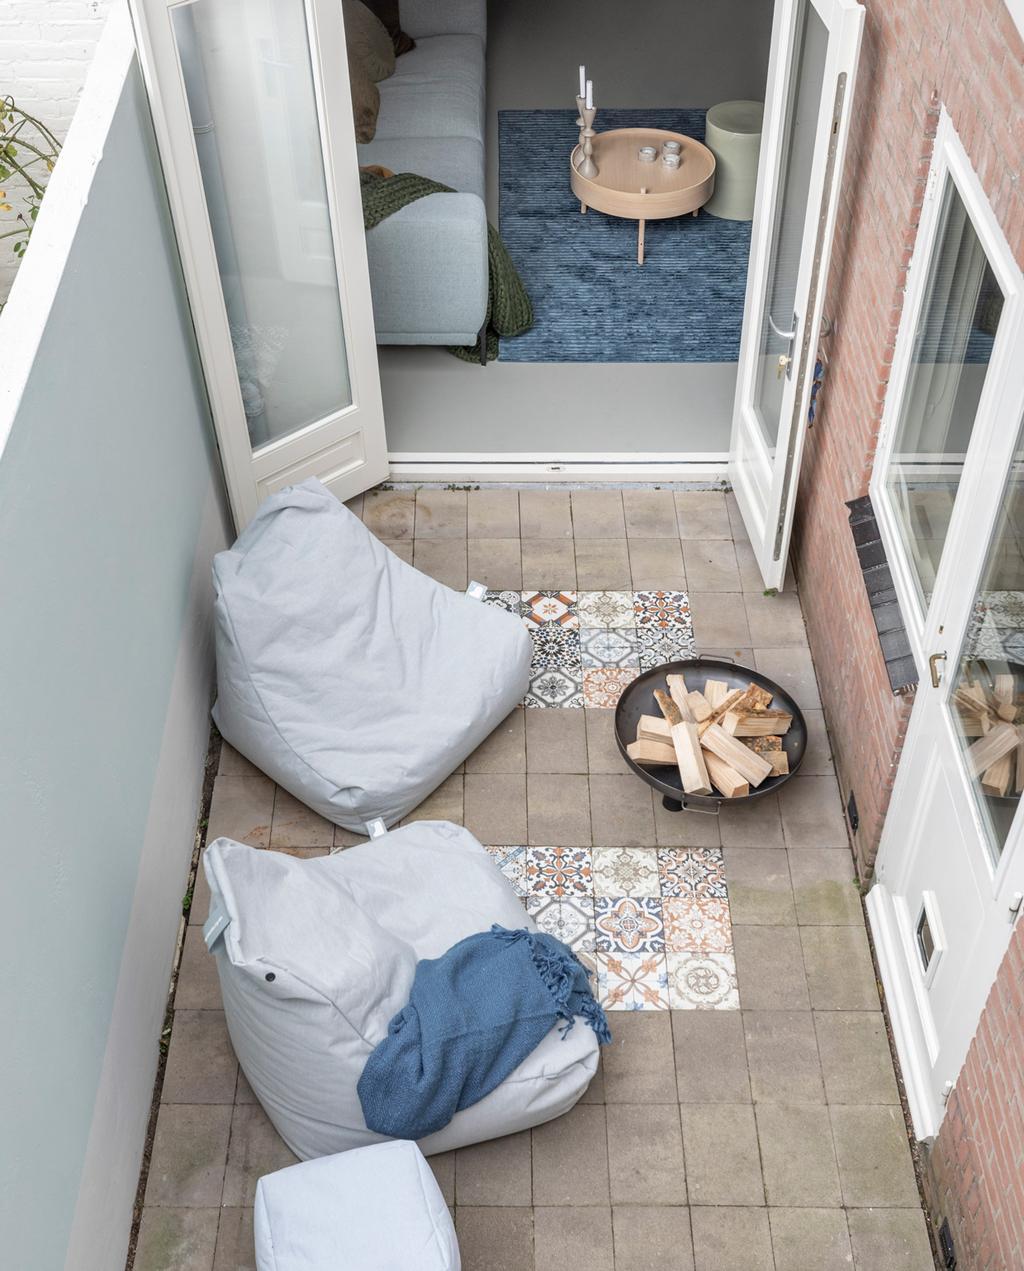 vtwonen weer verliefd op je huis | aflevering 9 seizoen 13 | Marianne in Haarlem